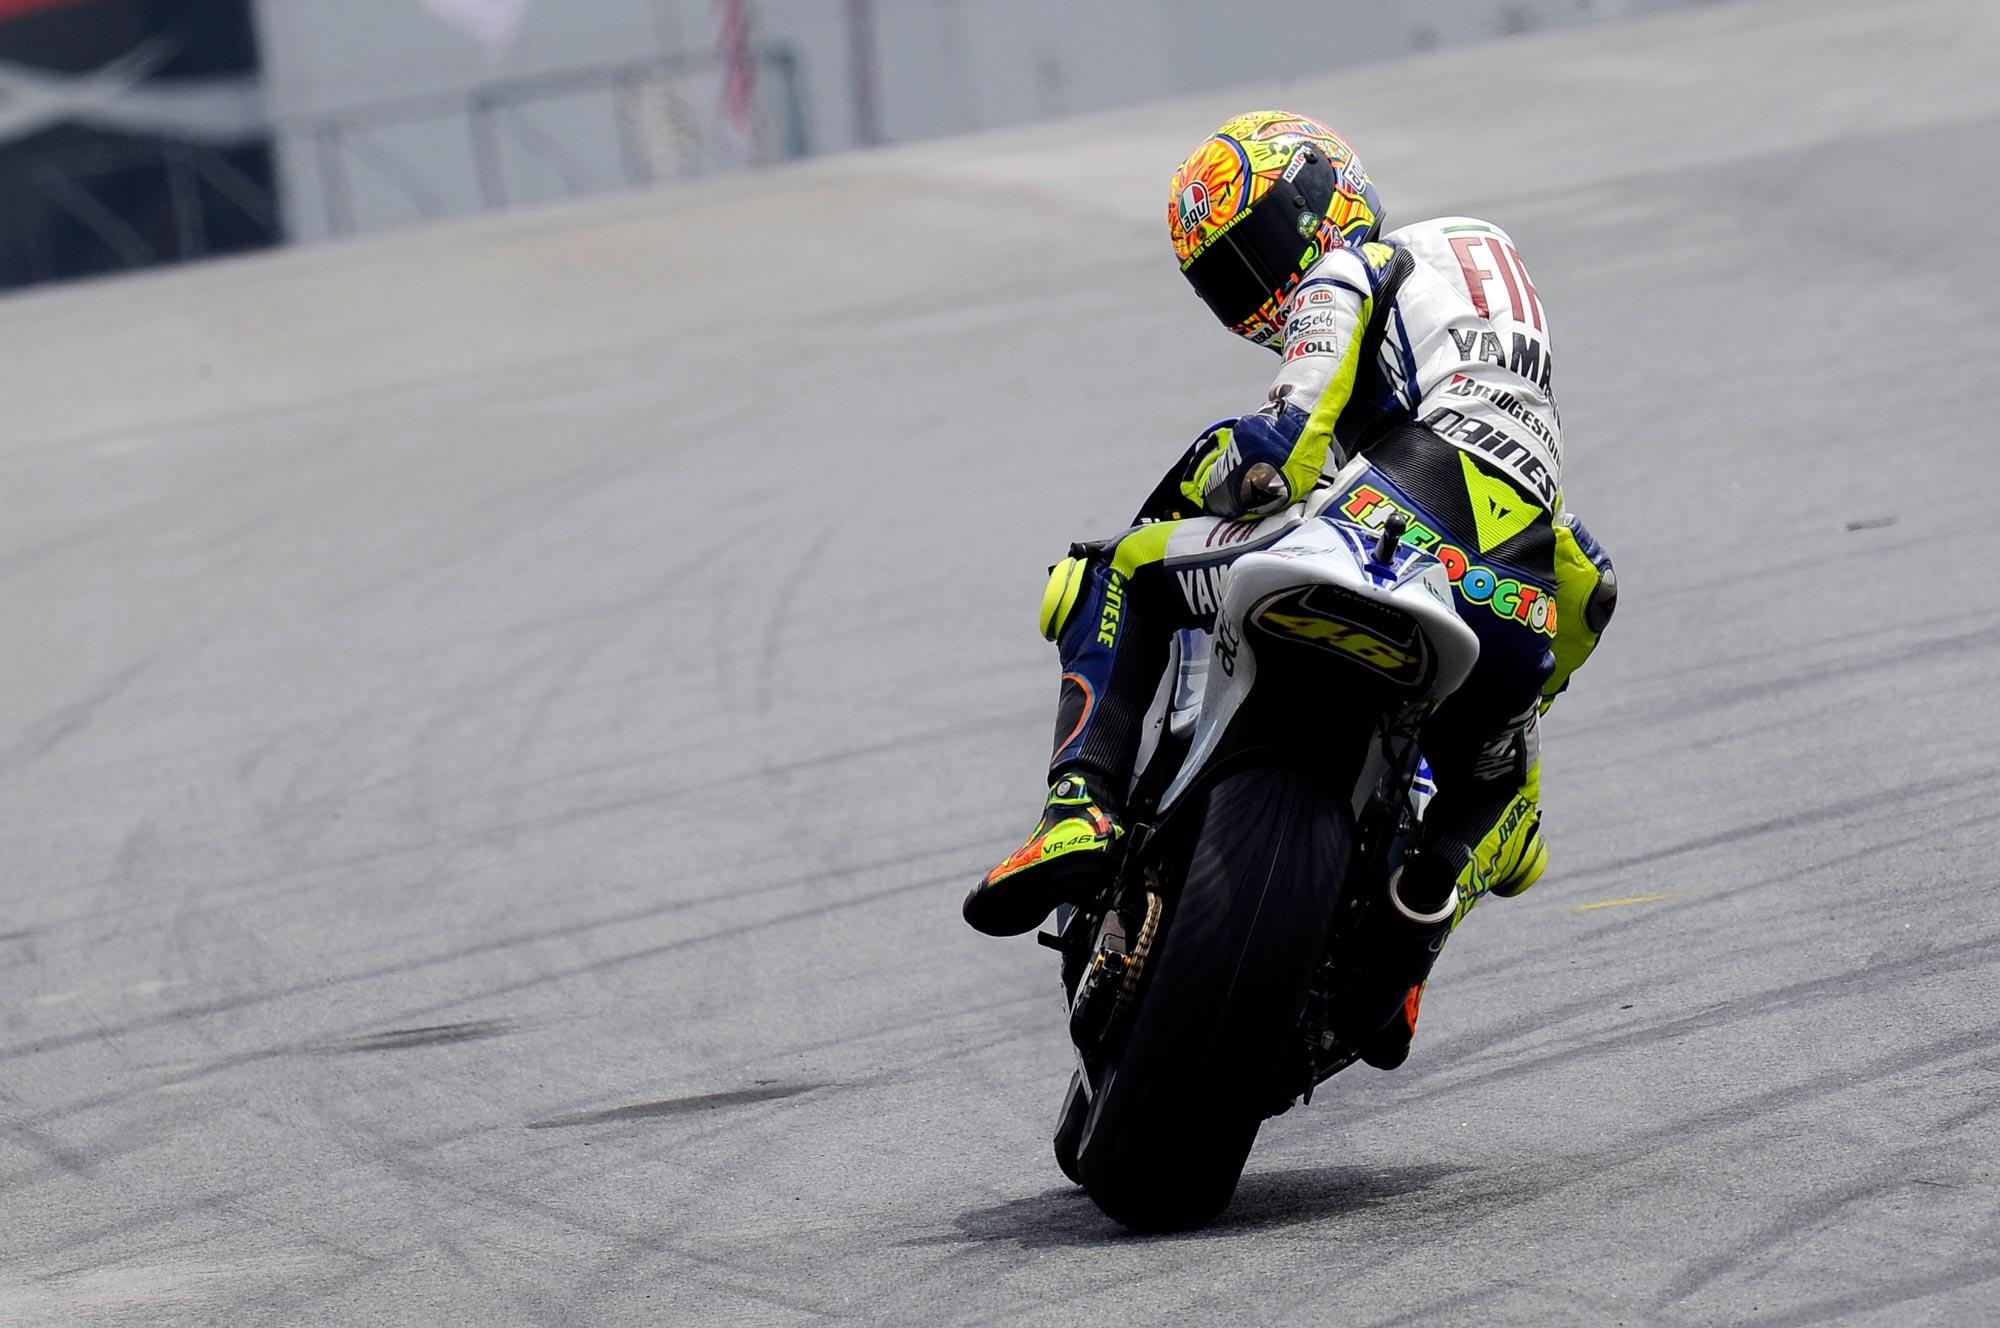 Valentino-Rossi-Malaysia-Yamaha.jpg